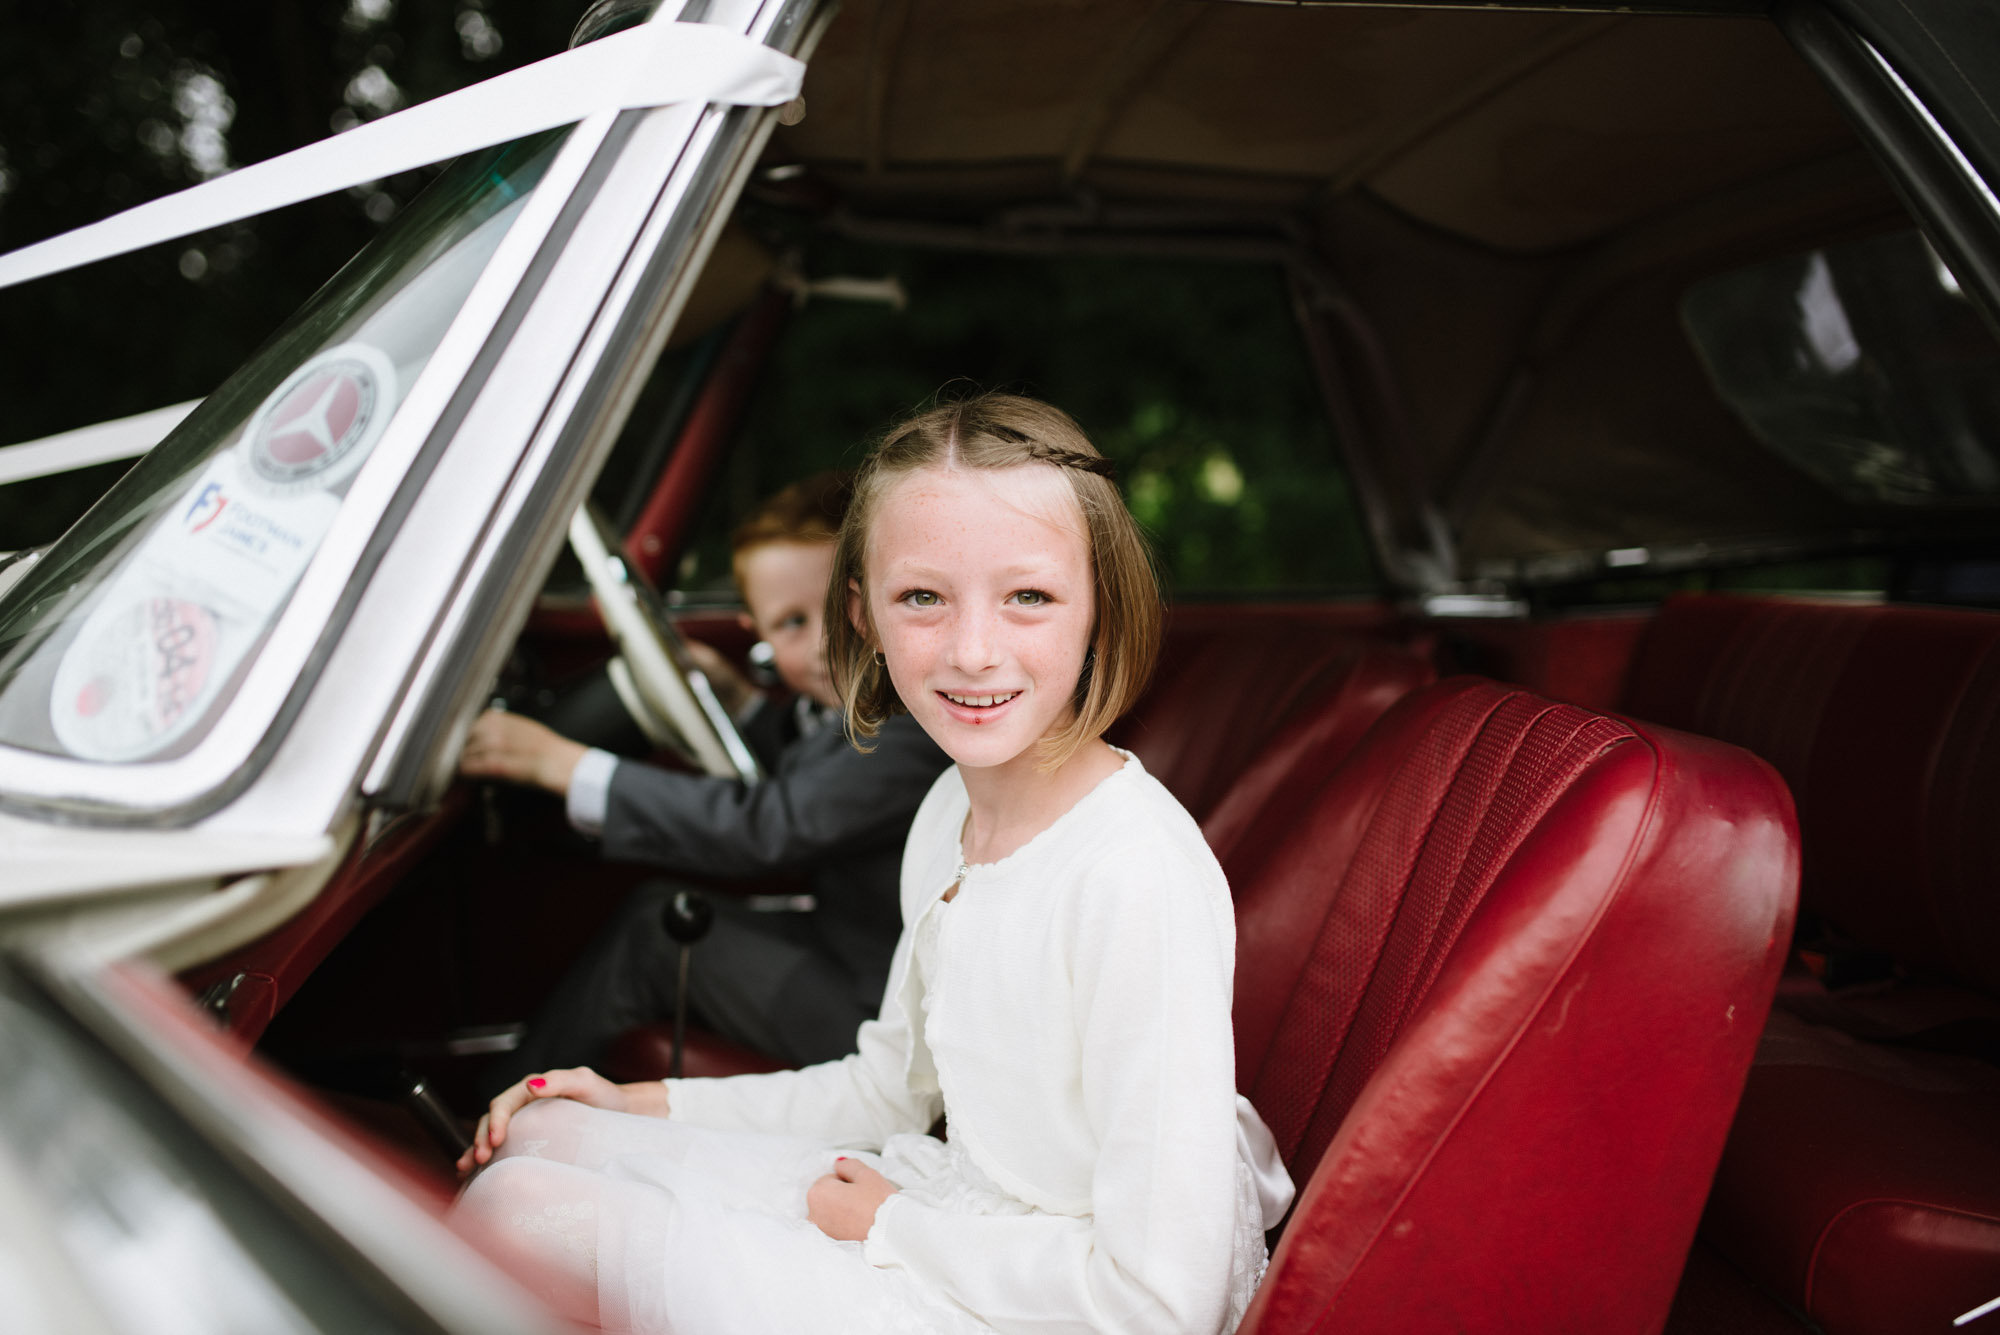 JessicaJillPhotography-13.jpg